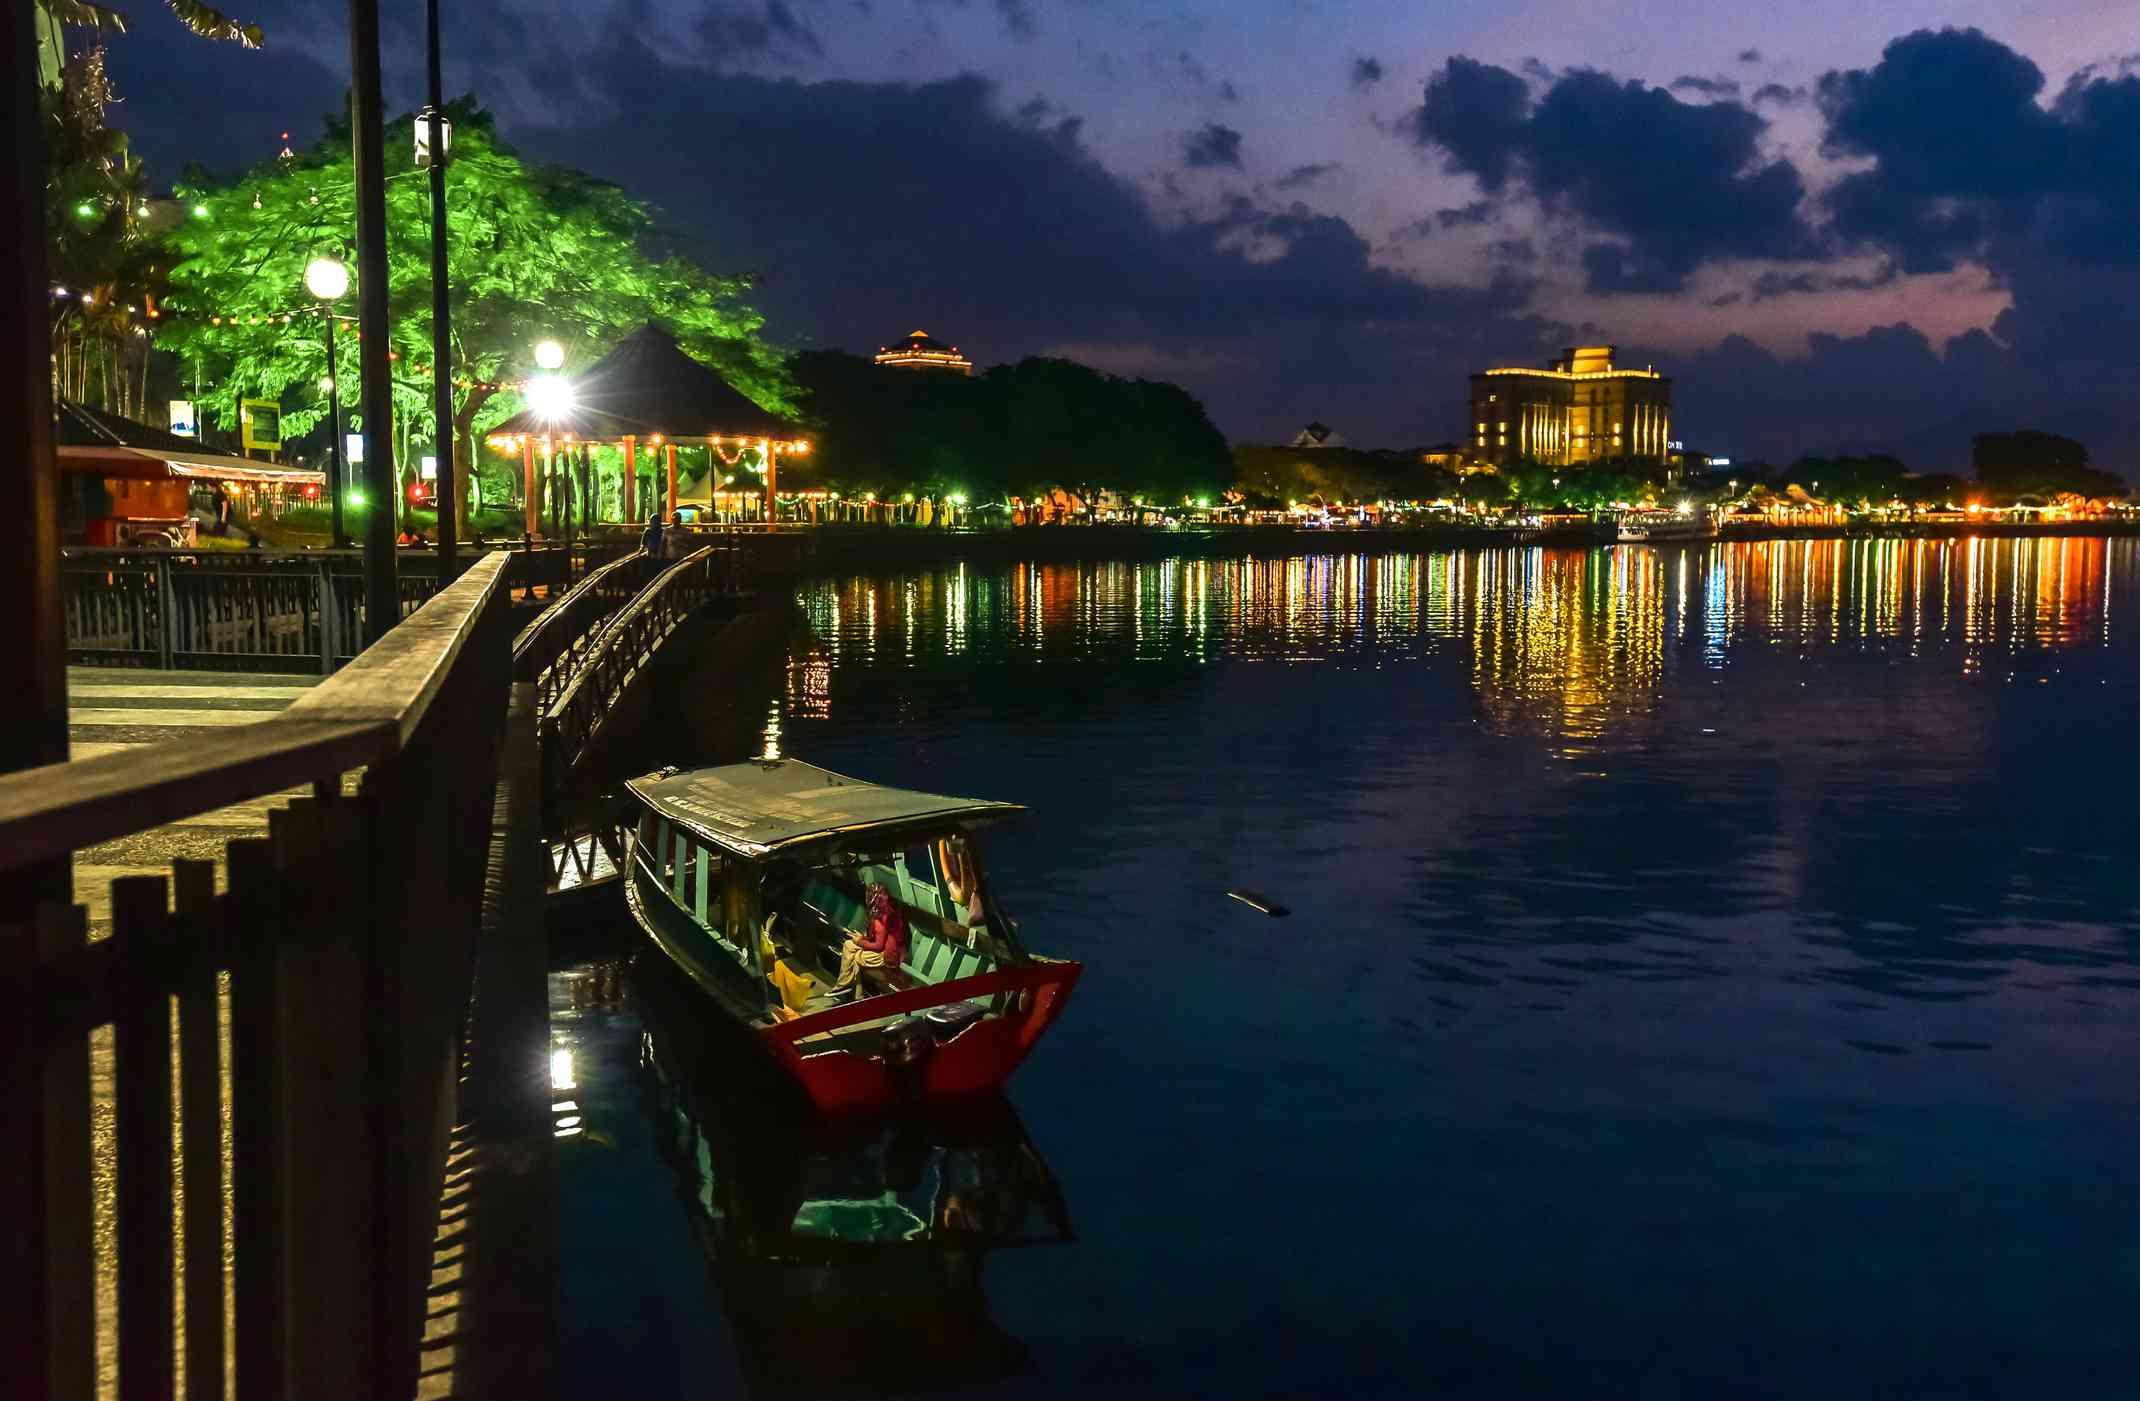 Water Taxi at dusk at the Kuching City Waterfront, Malaysia